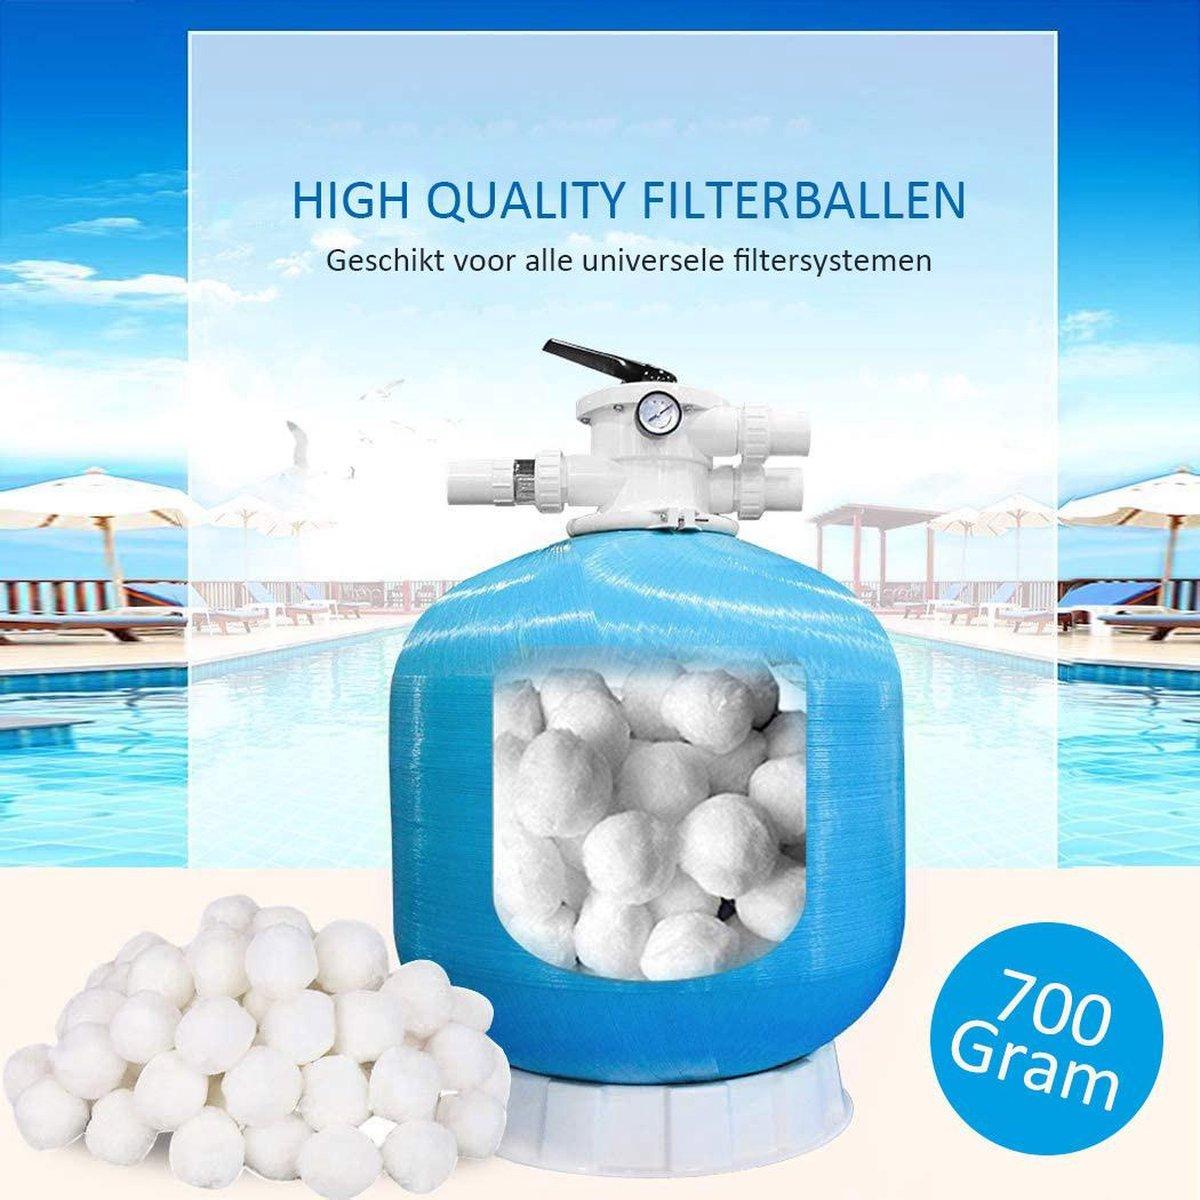 Meisterhome - Filterballen 700 gram vervanging voor 25kg zand - zwembad - filter ballen - Polysphere balletjes